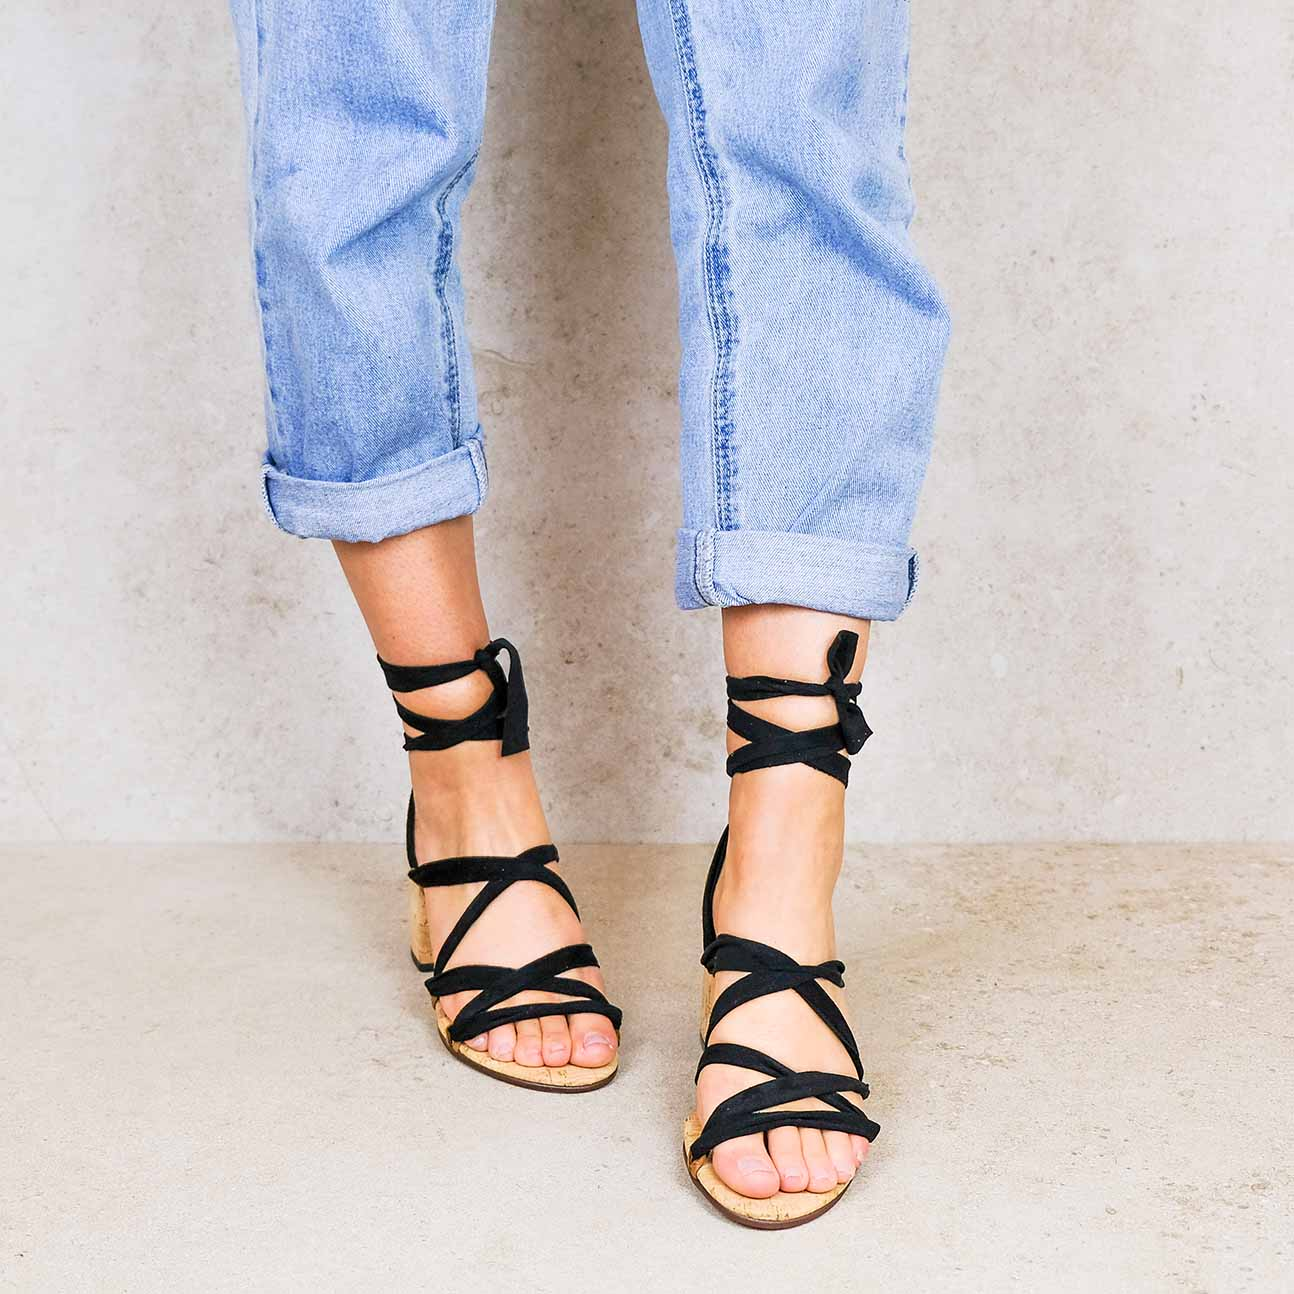 Camila-lintsandalen sandals travelsandals vegan sustainable sandals wikkelsandalen